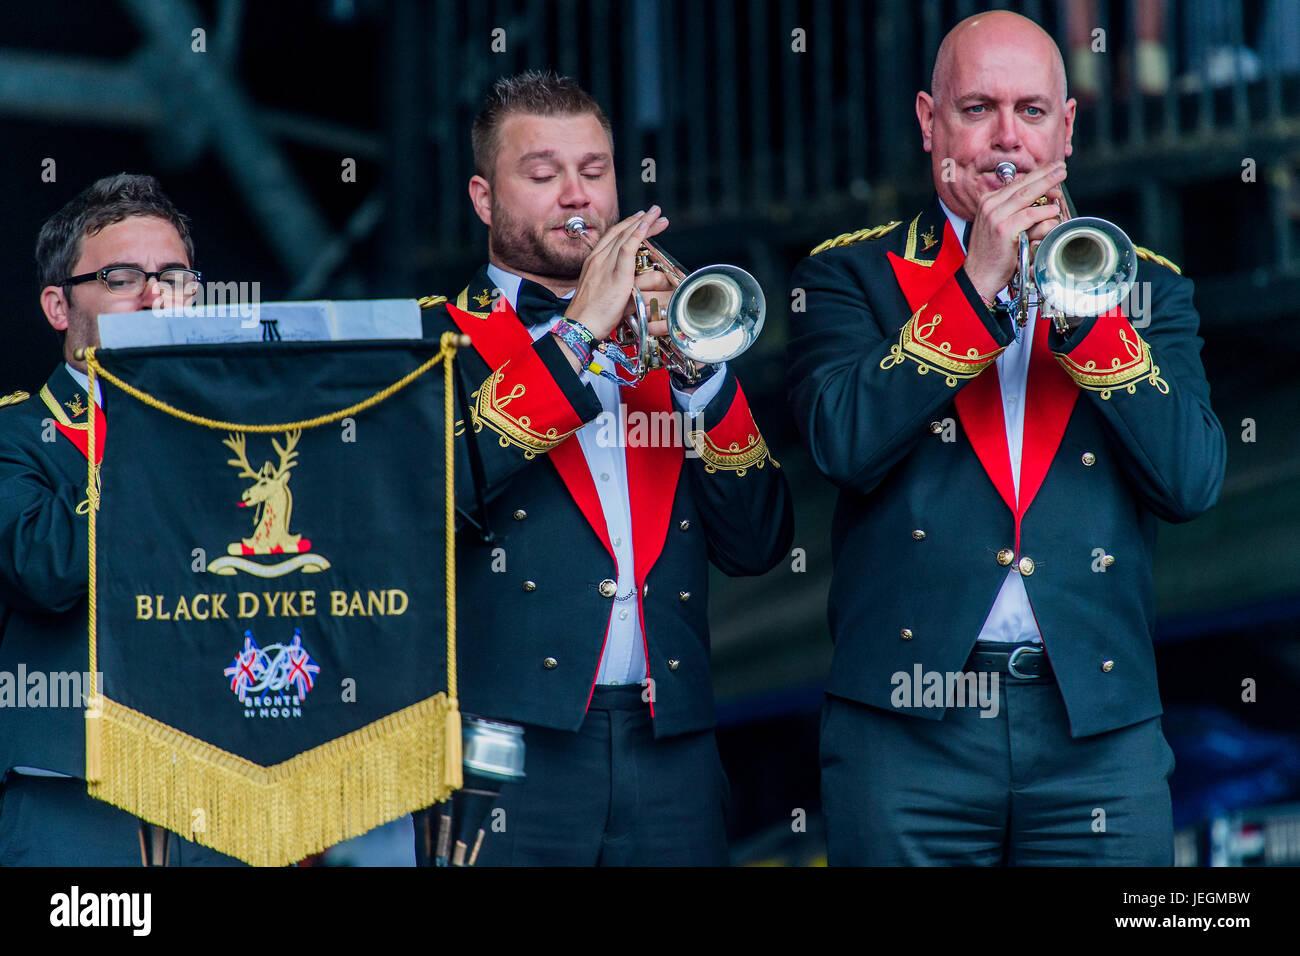 Glastonbury, UK  24th June, 2017  The Black Dyke Brass Band